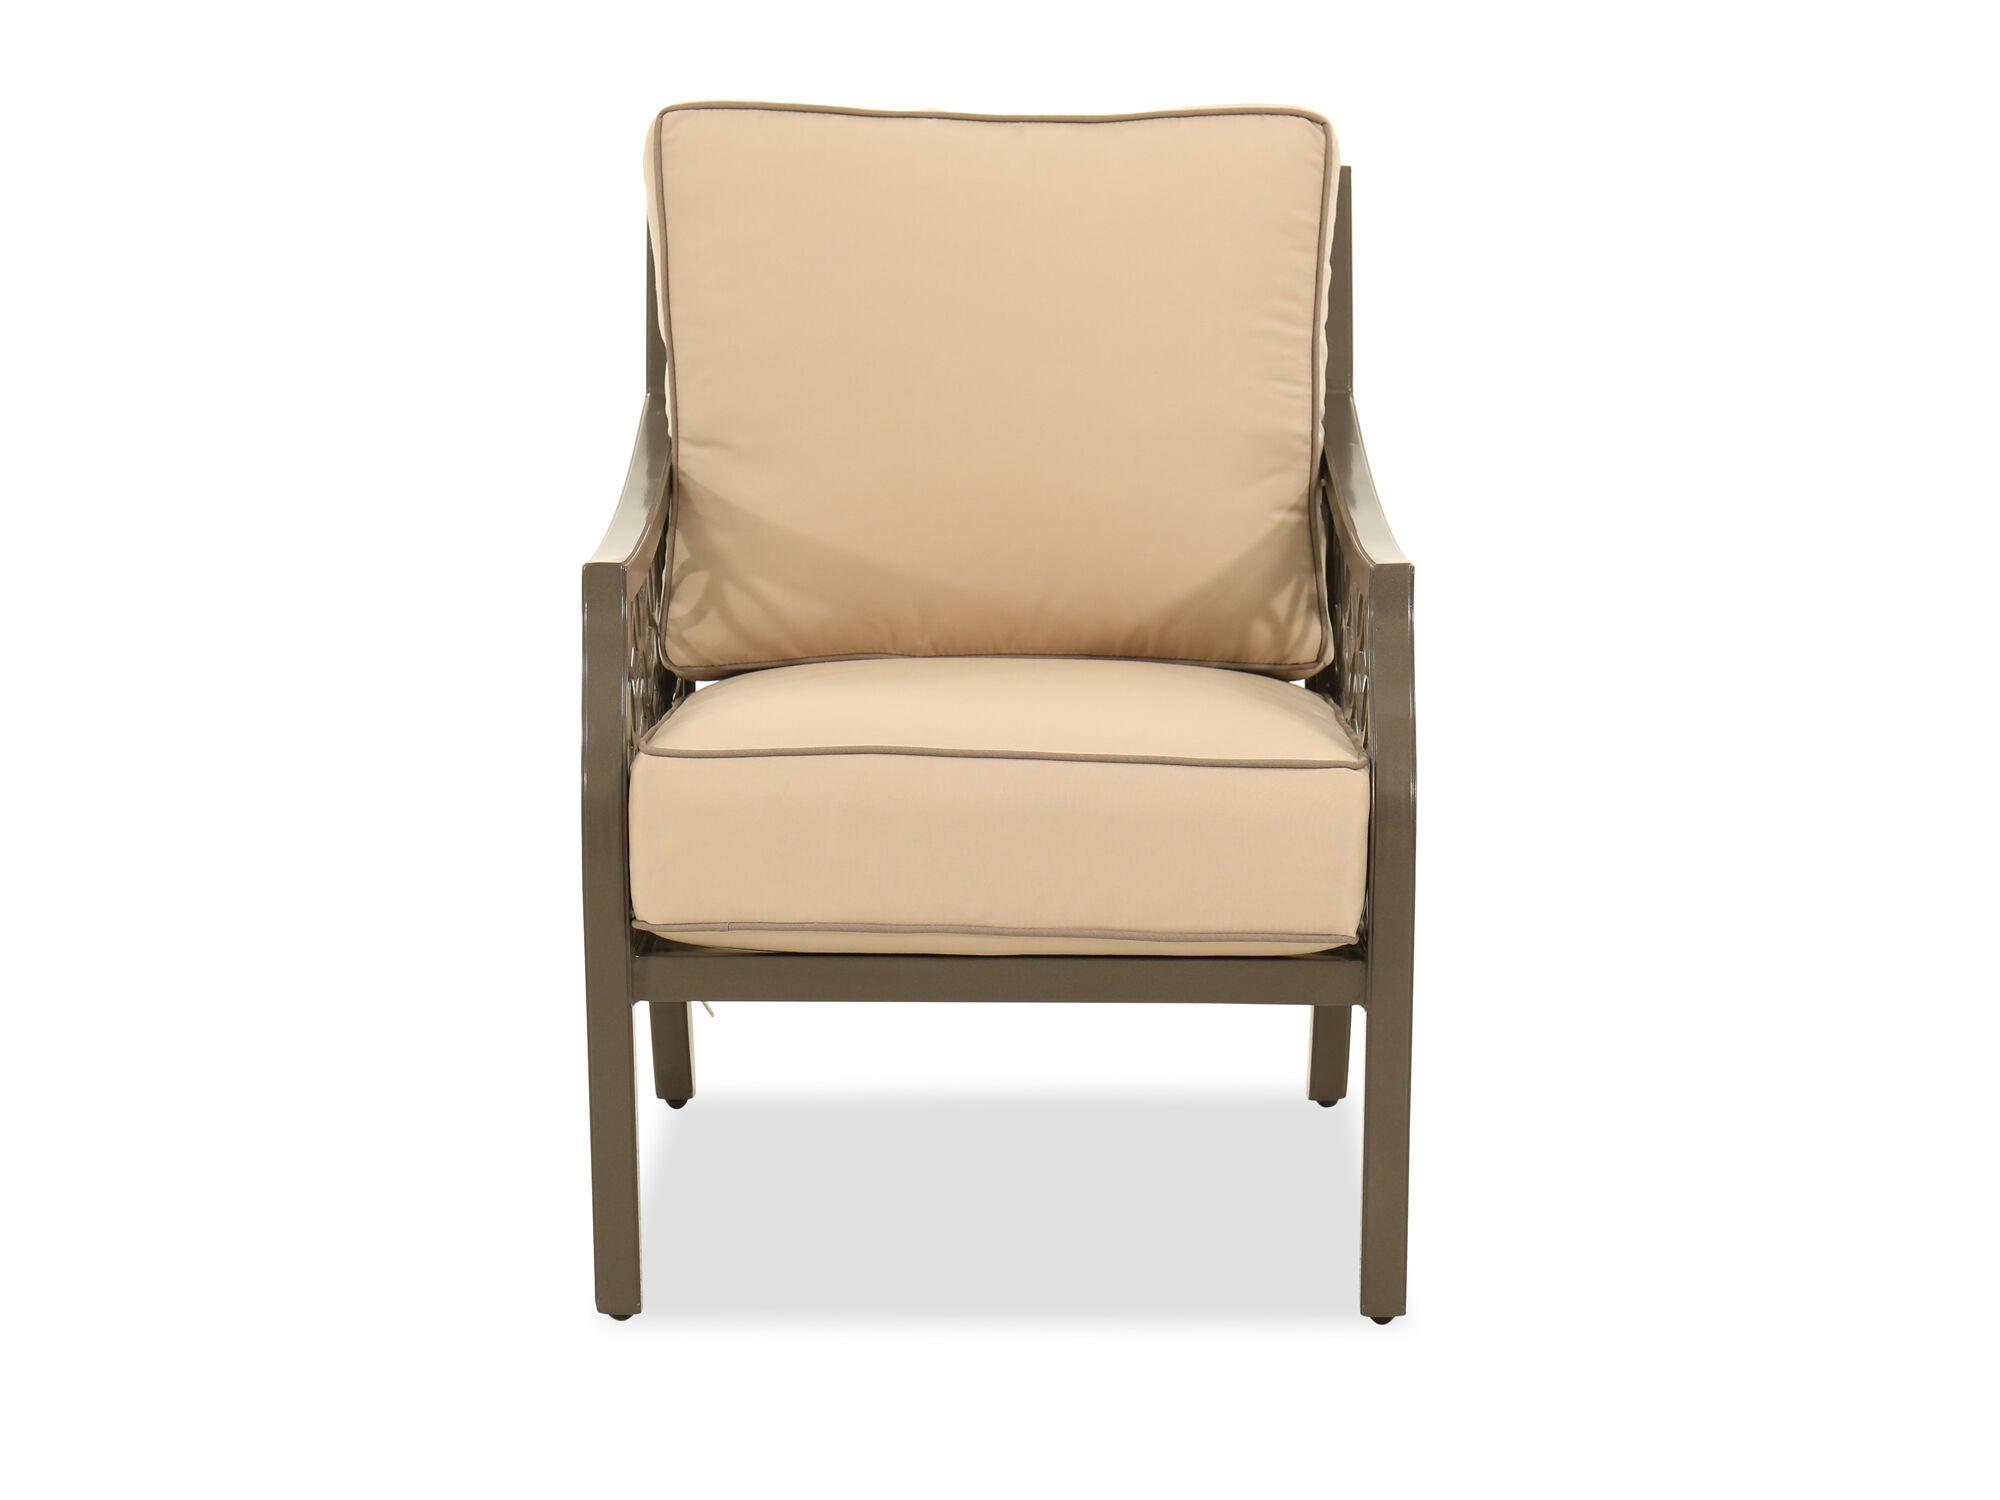 LatticeBack Cushioned Patio Club Chair in Brown  Mathis